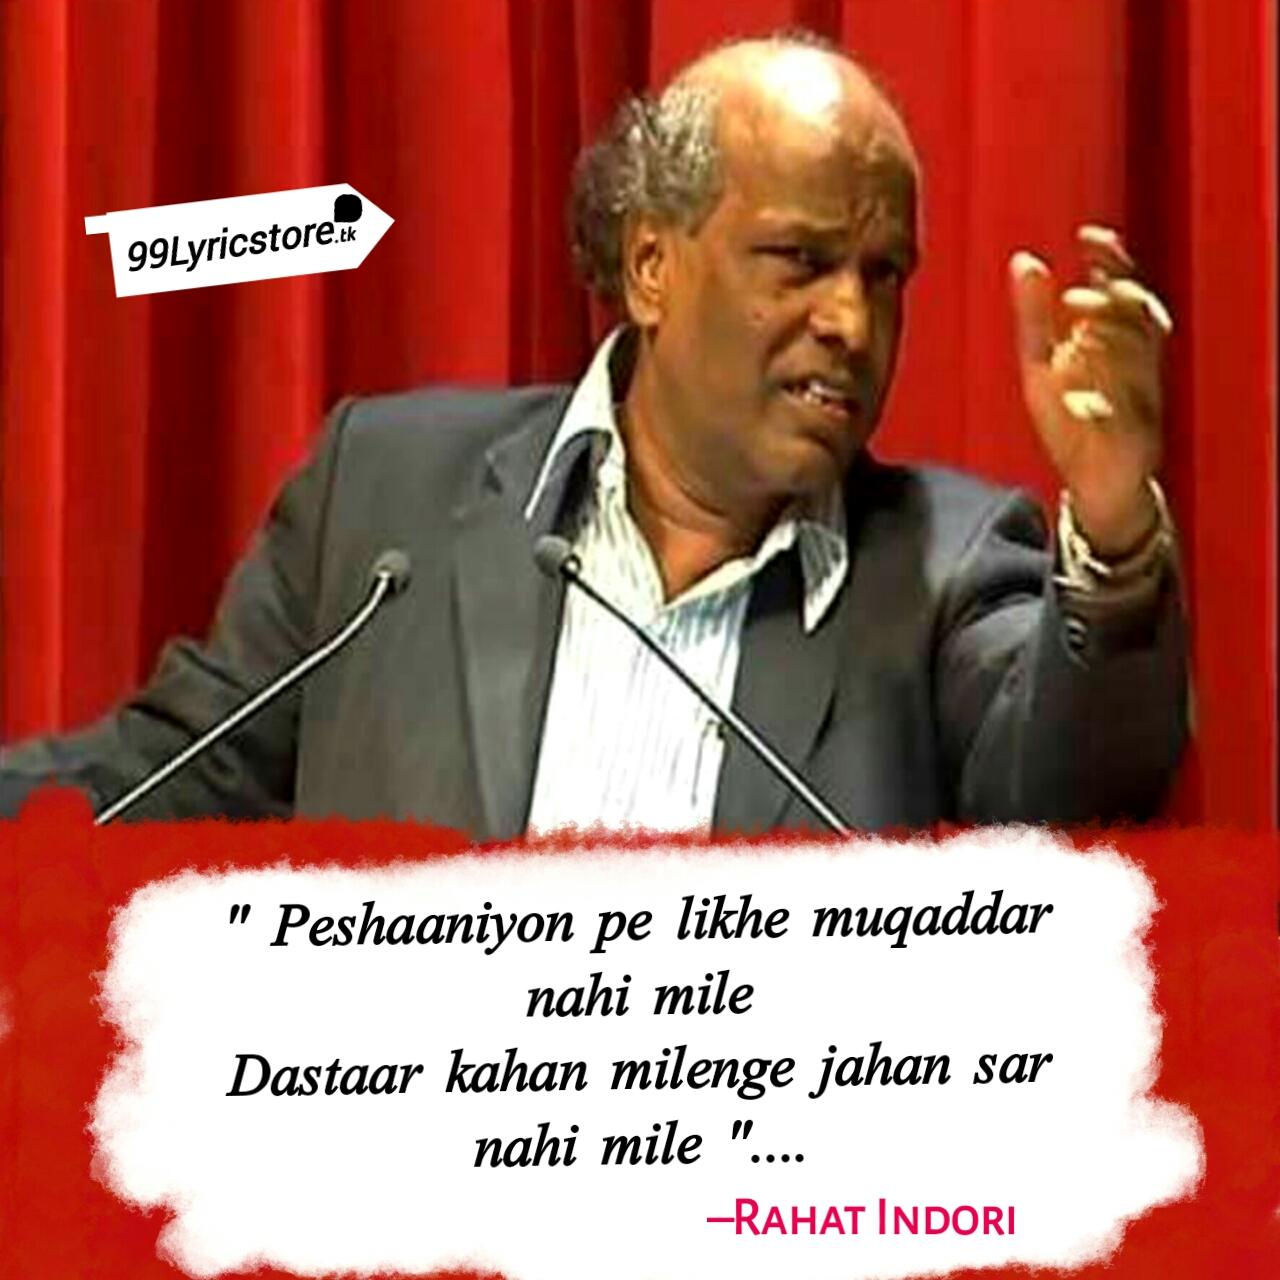 Peshaaniyon pe likhe muqaddar nahi mile – Rahat Indori | Ghazal Poetry, Rahat Indori shayari, Rahat Indori Peshaniyo Pe Likhe Muqaddar lyrics, Mushaira, Rahat Indori image ,